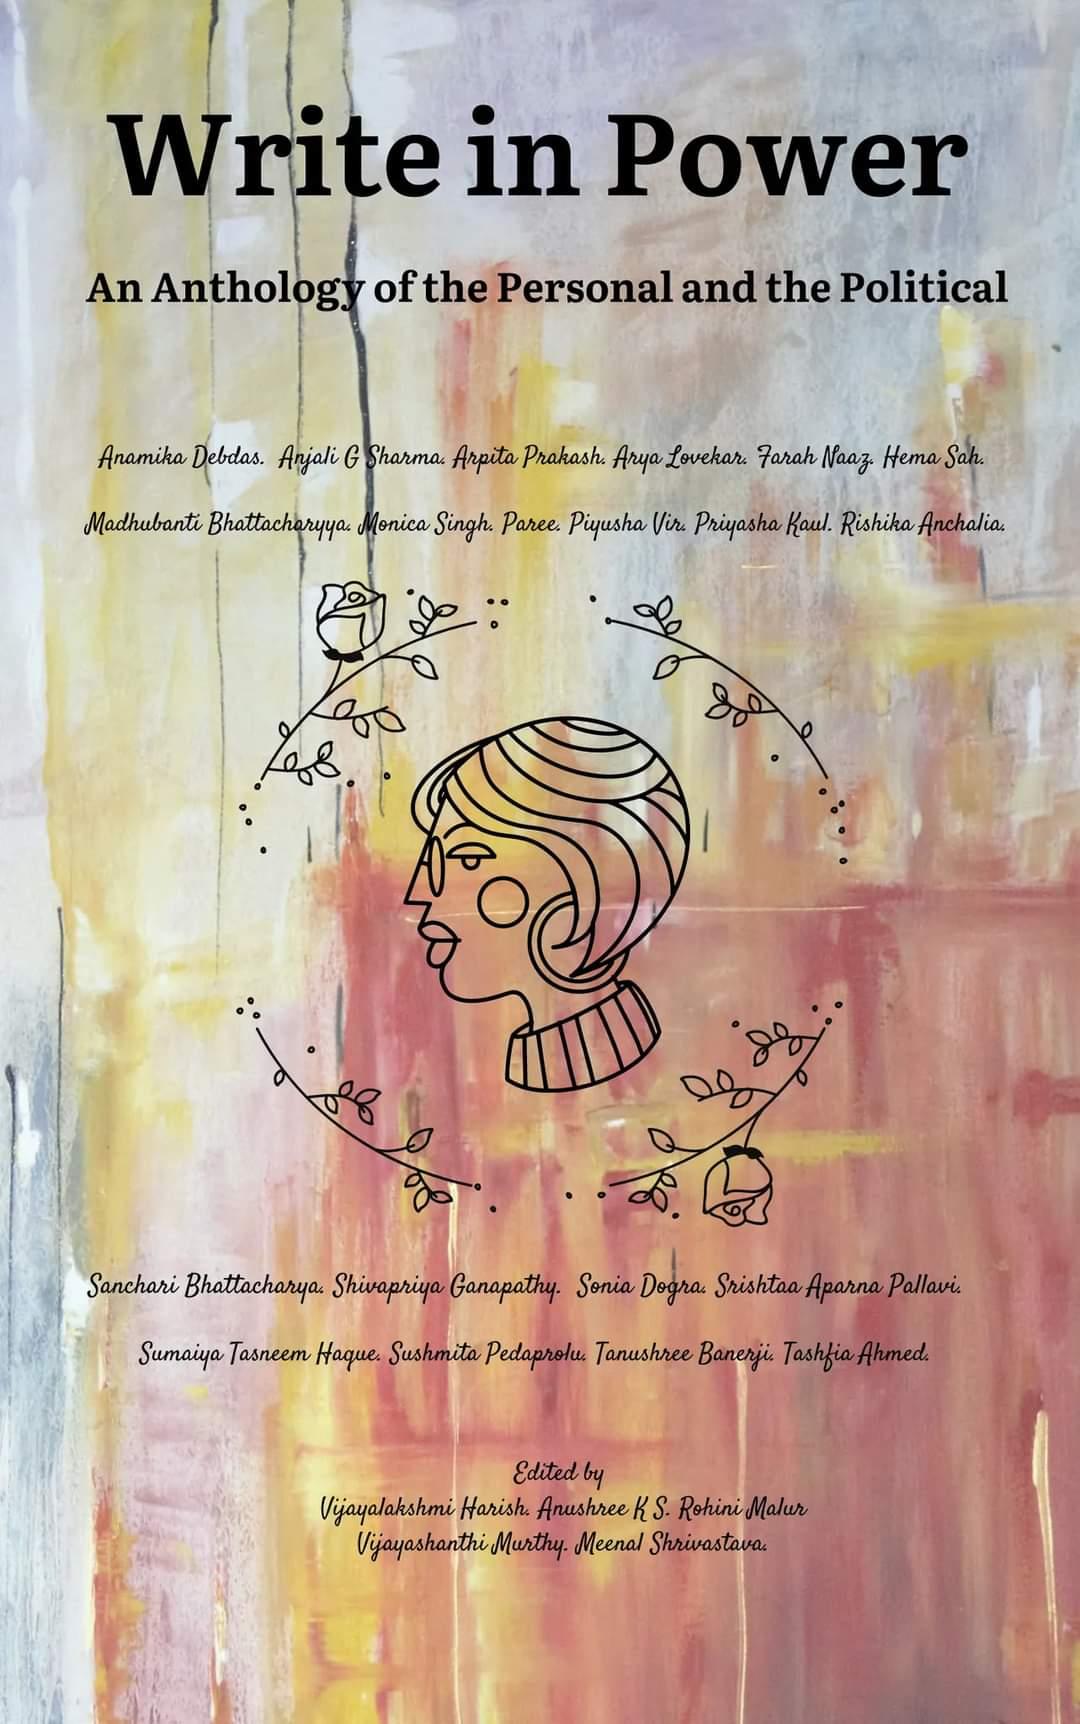 Write In Power: An Anthology of the Personal and the Political by Vijayalakshmi Harish, Meenal Shrivastava, Vijayashanthi Murthy, Anushree K S, Rohini Malur